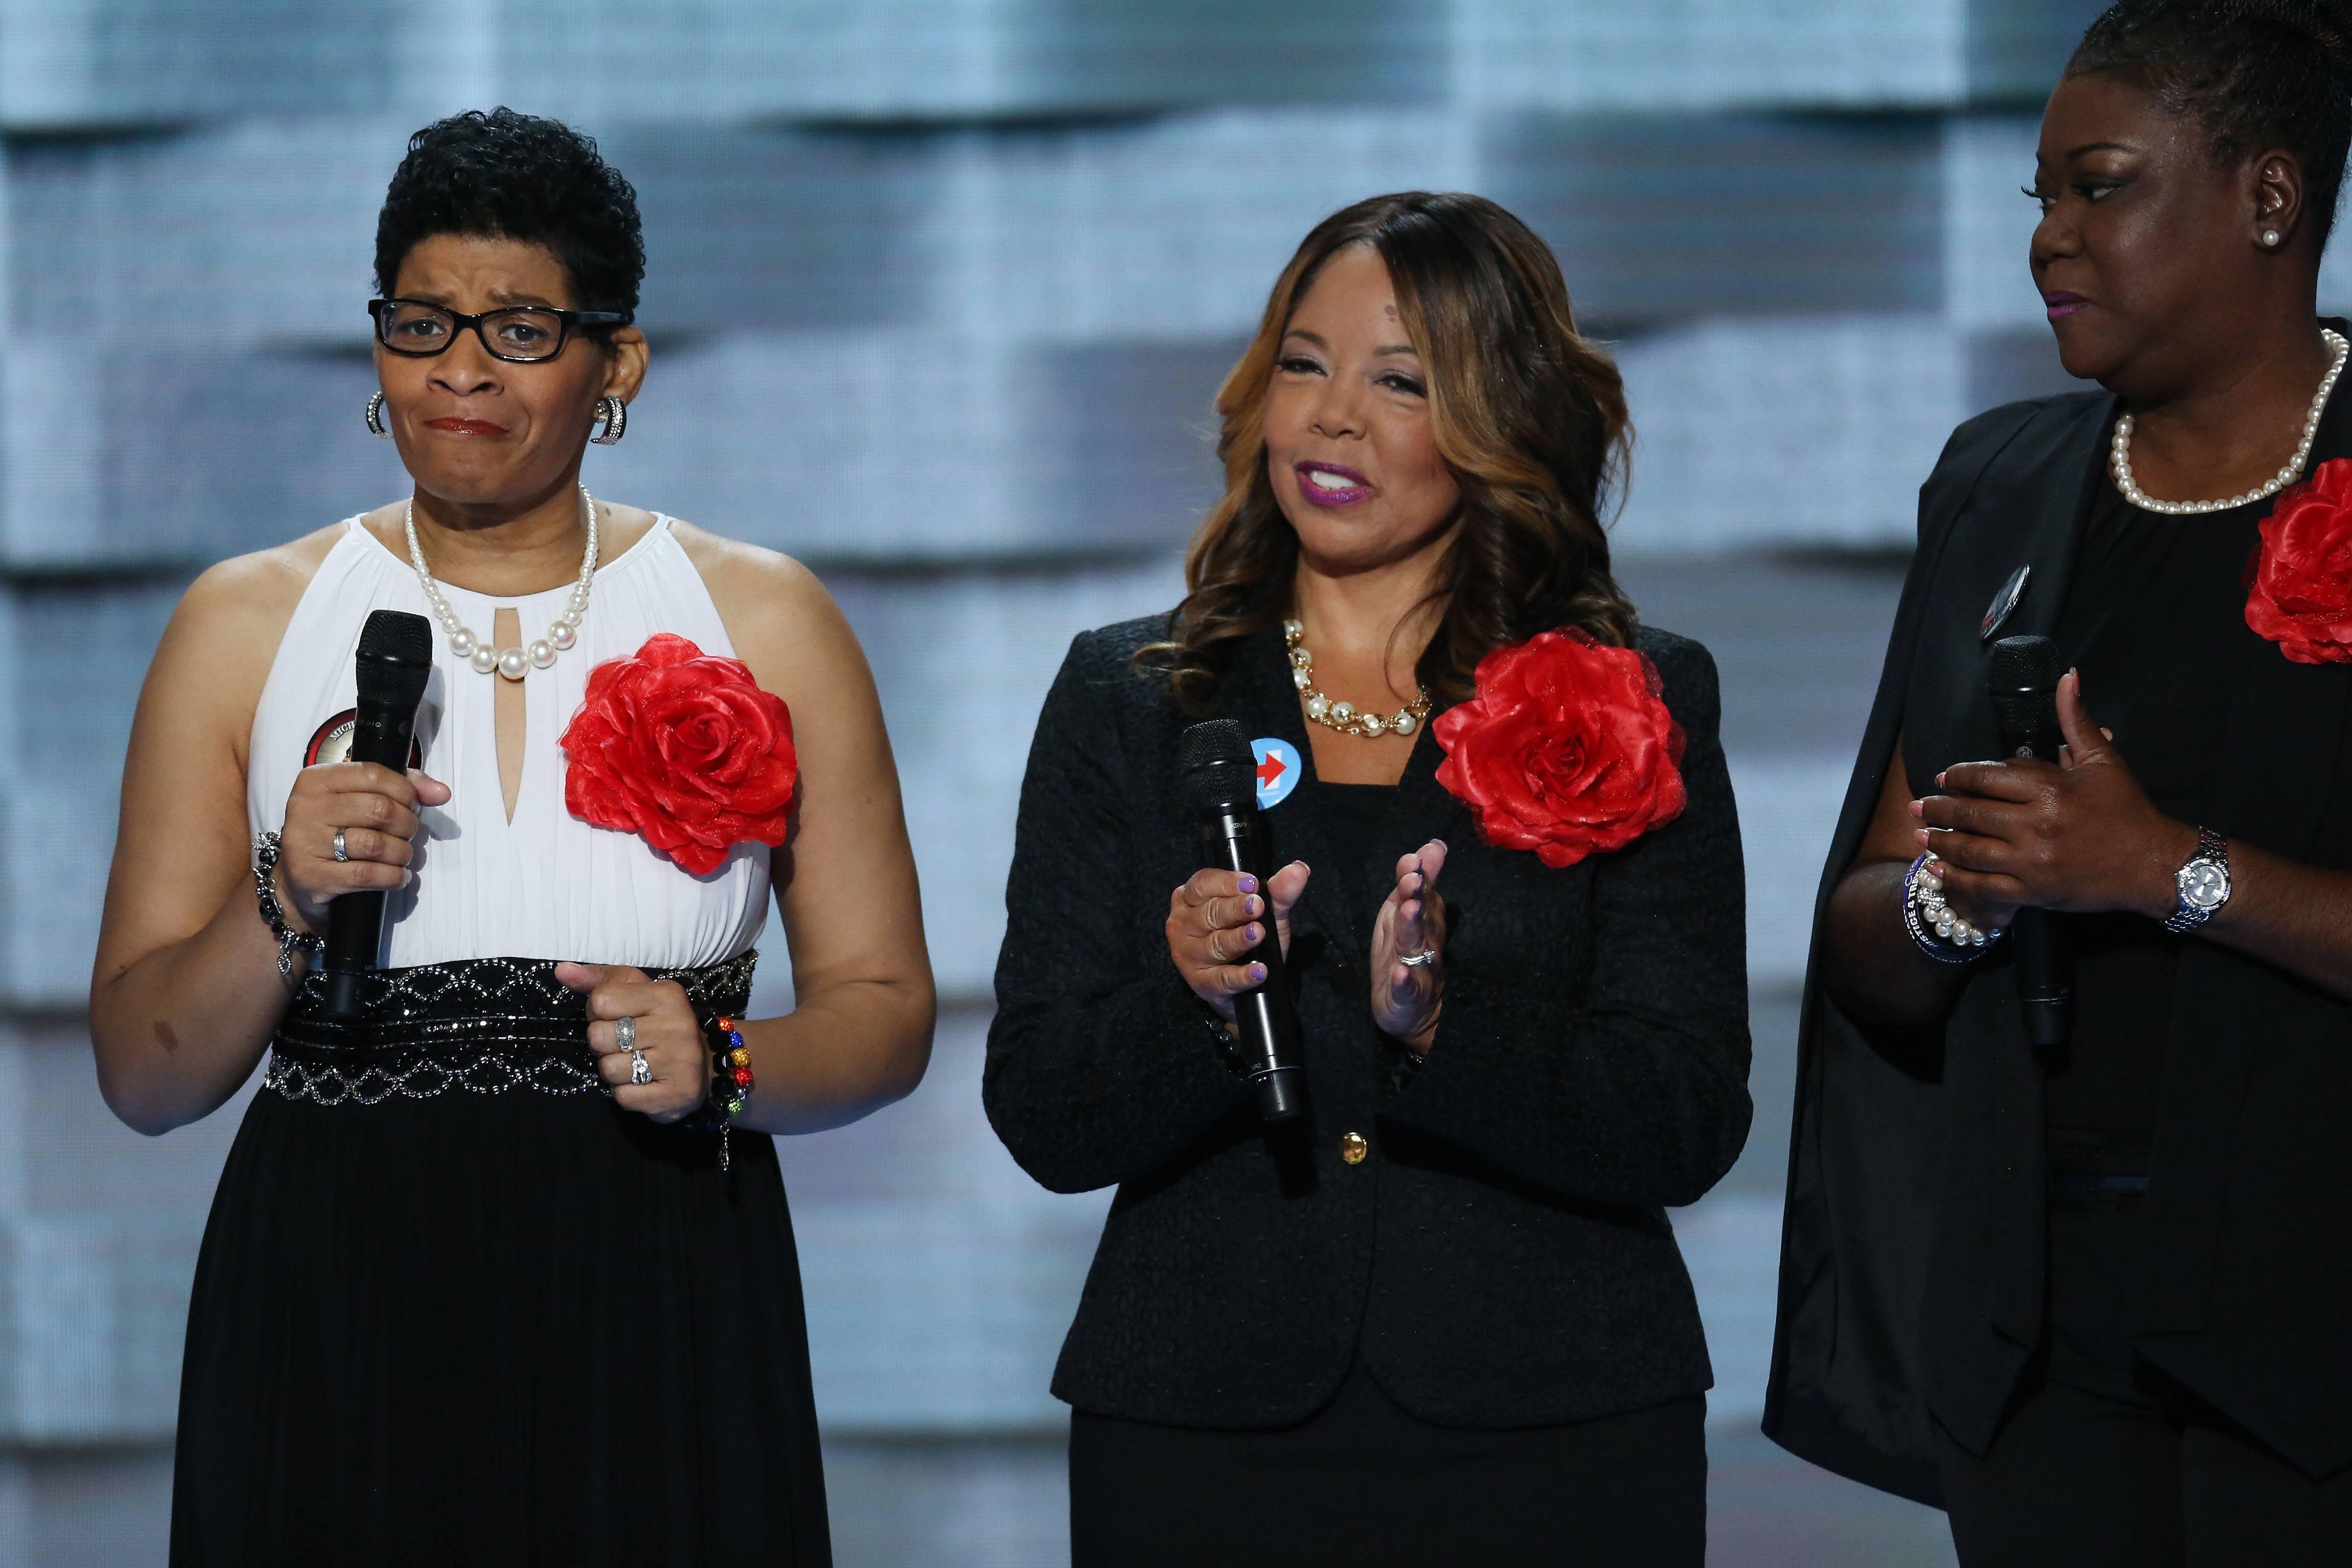 Bland's mother at DNC: Black life cut short 'a national loss'